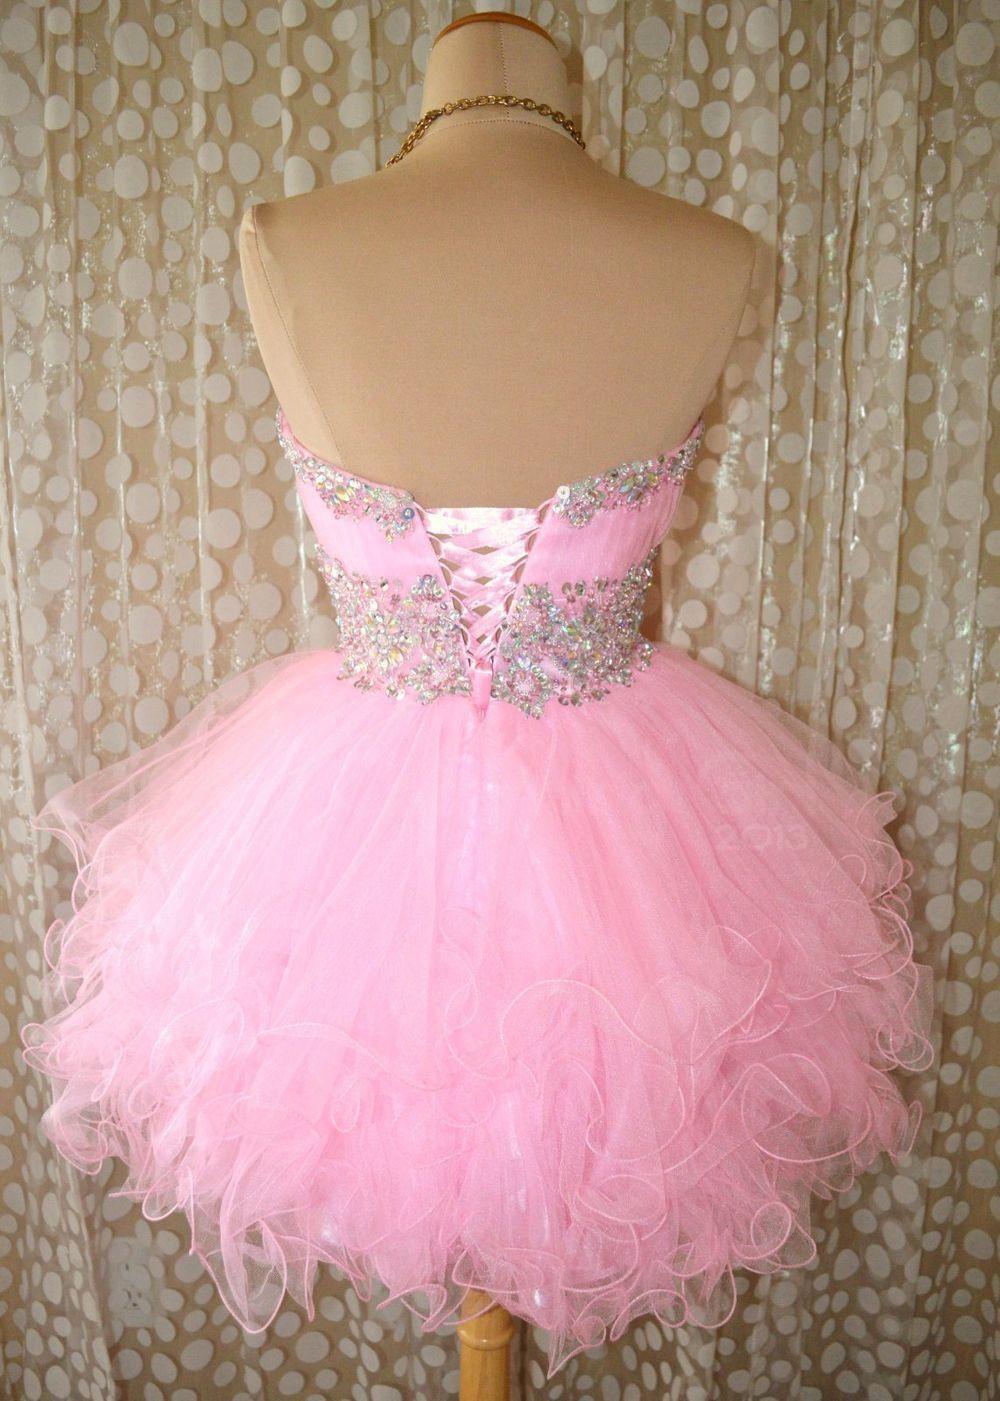 Charming Light Pink Tulle Short Prom Dress Evening Dresses On Storenvy